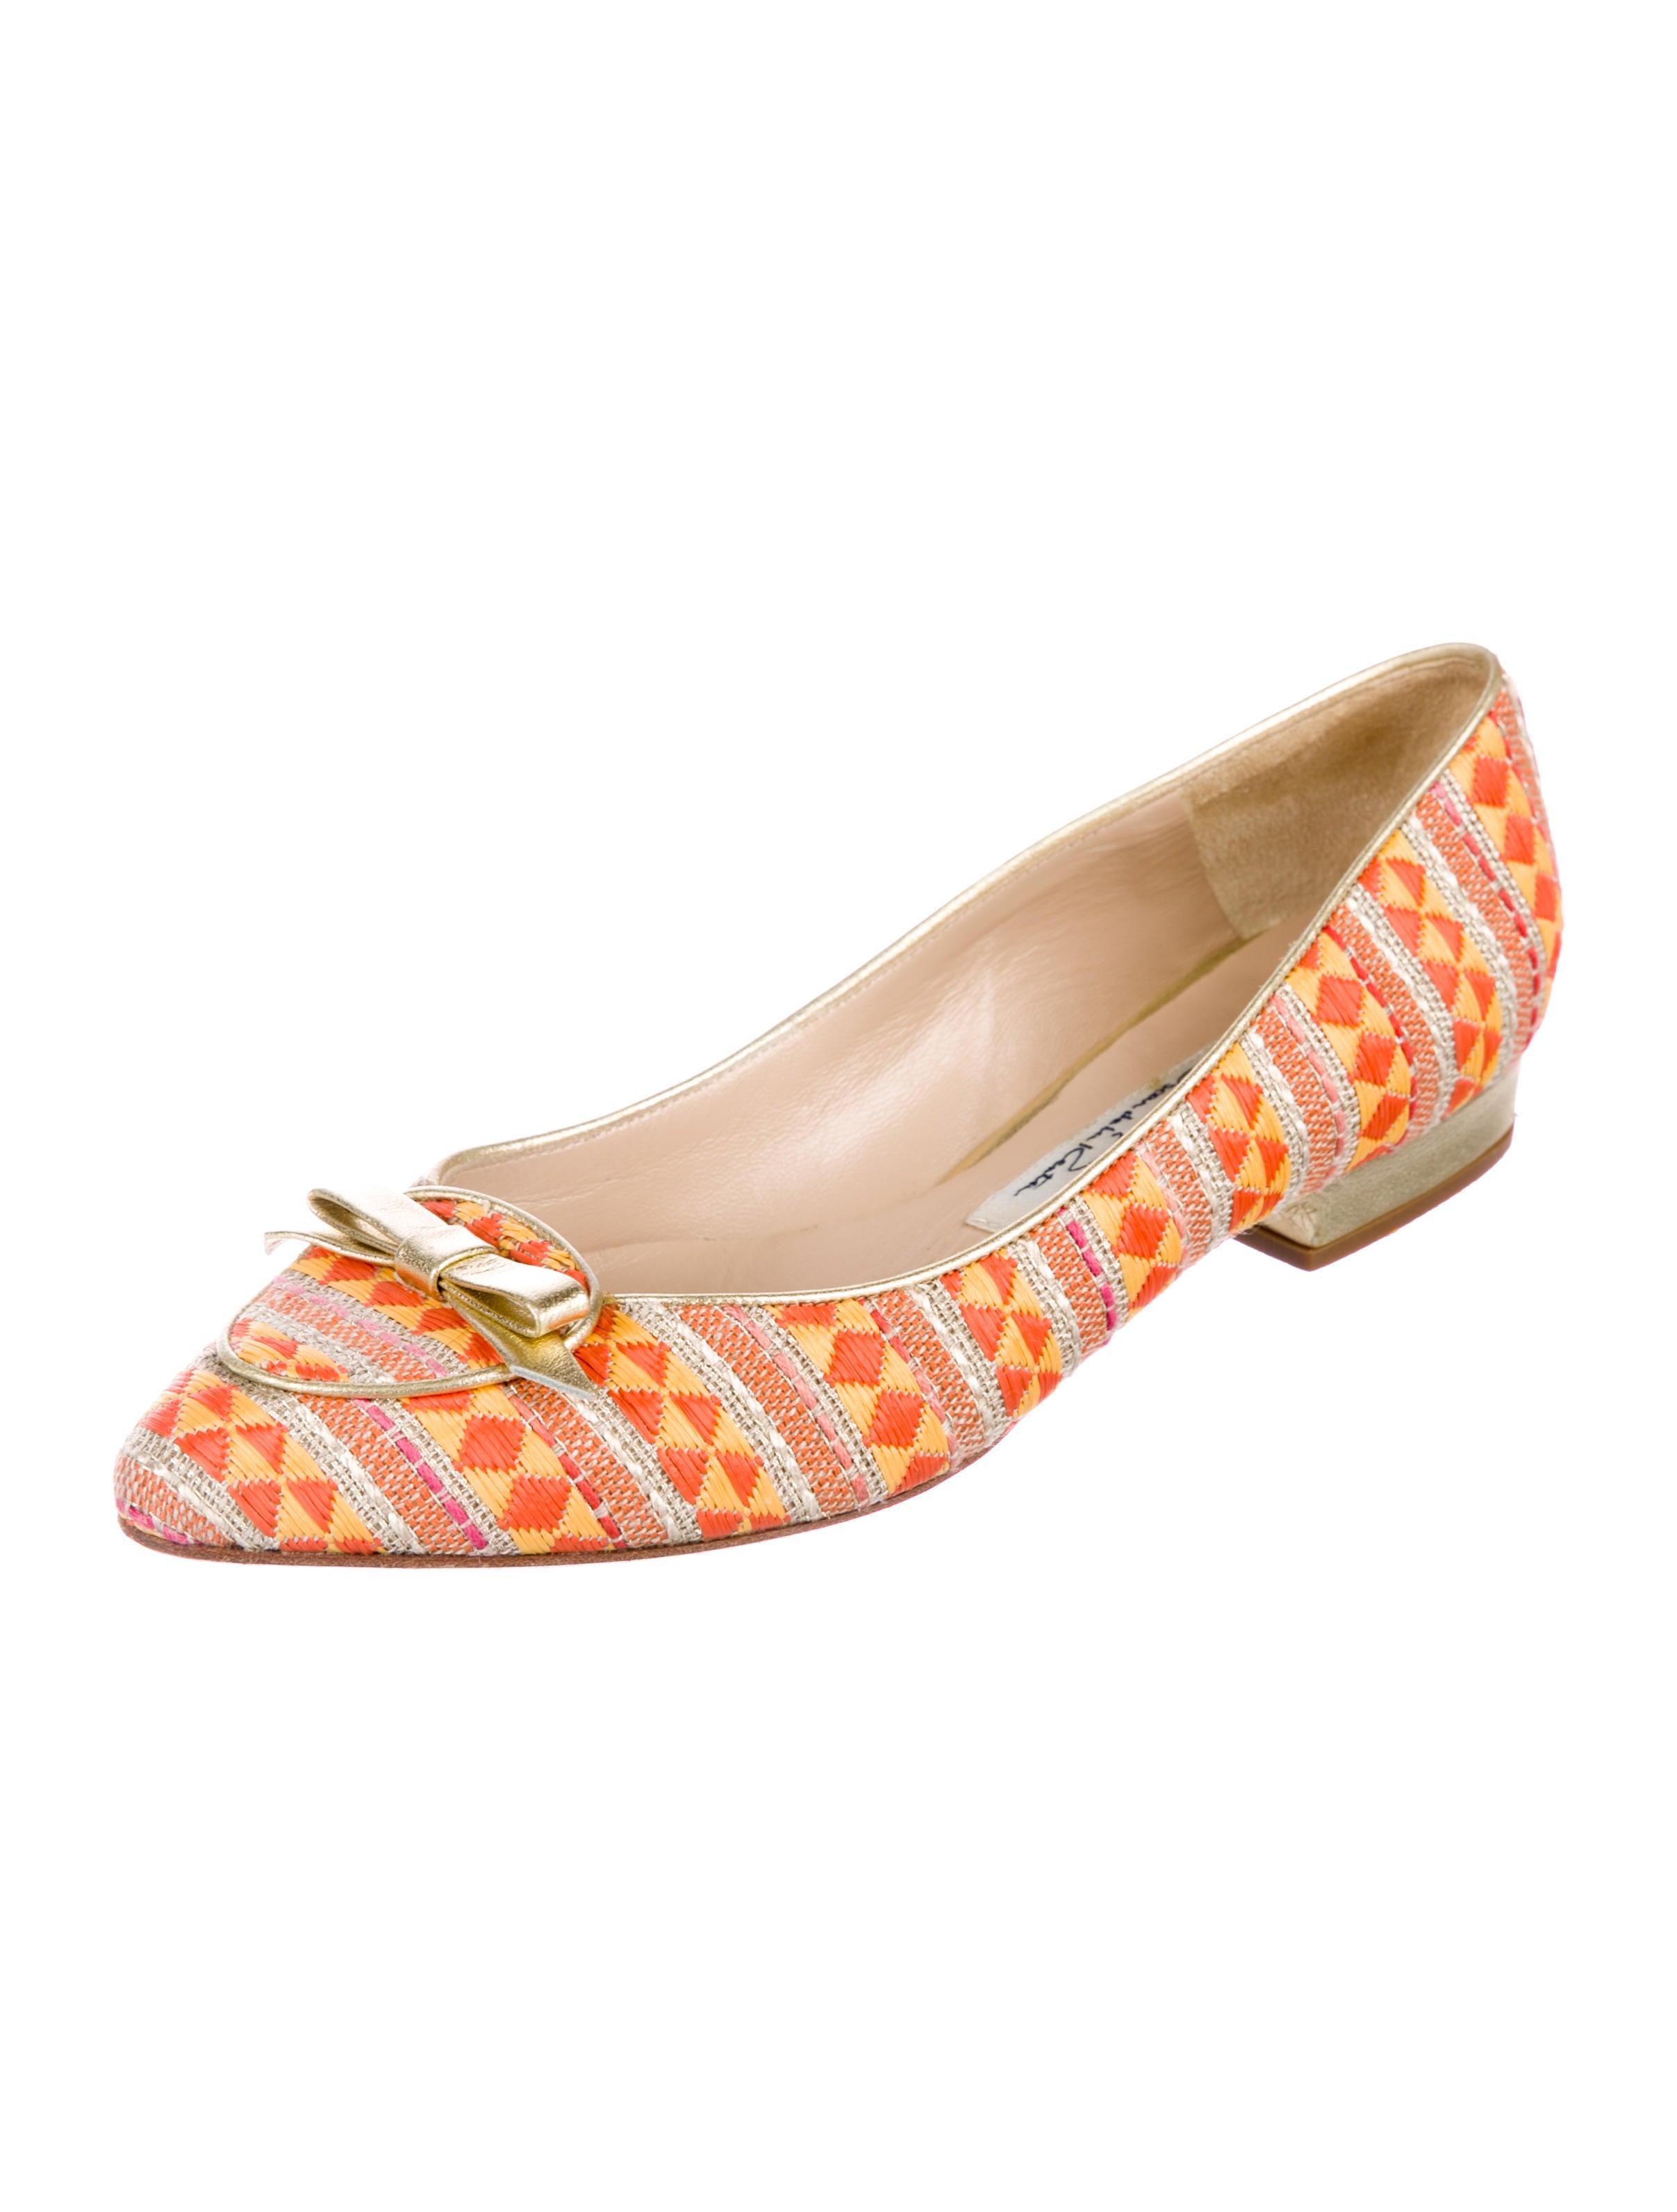 Oscar de la Renta Raffia Pointed-Toe Flats online cheap price 6l4D0JPGF